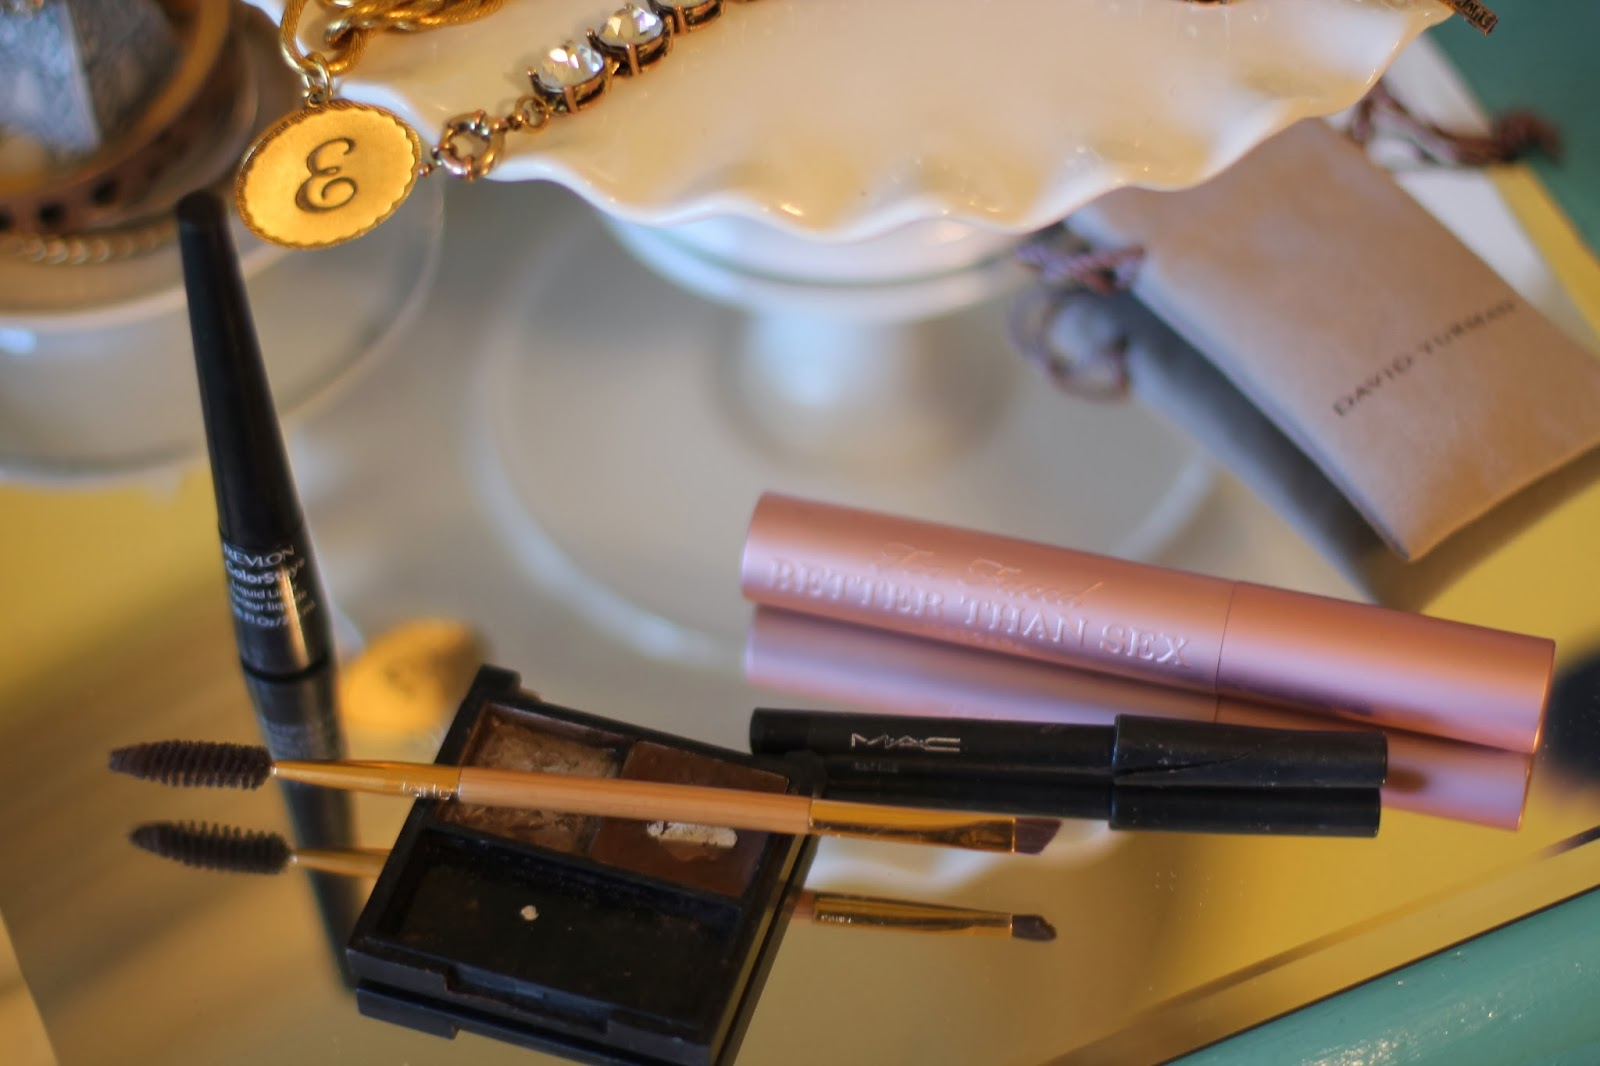 www.TheSweetestThingBlog, Emily Gemma, Makeup, MAC cosmetics, Mac Studio Fix Powder, Makeup Review, Mac Bronzer, Mac Blush, Better than Sex Mascara, Revlon Eye Liner, Make up brushes, Mac makeup brushes, Makeup Brush Holder, Monogram Makeup Brush Holder, Tarte Makeup Brush, Mac Eye Liner, Mac Foundation, Sephora Make up brush, Concealer, Tarte Blush, Mac Lipsticks, Ulta Makeup Brushes, Pinterest Makeup, Eyebrow Makeup, Browzings kit, Benefit Browzings